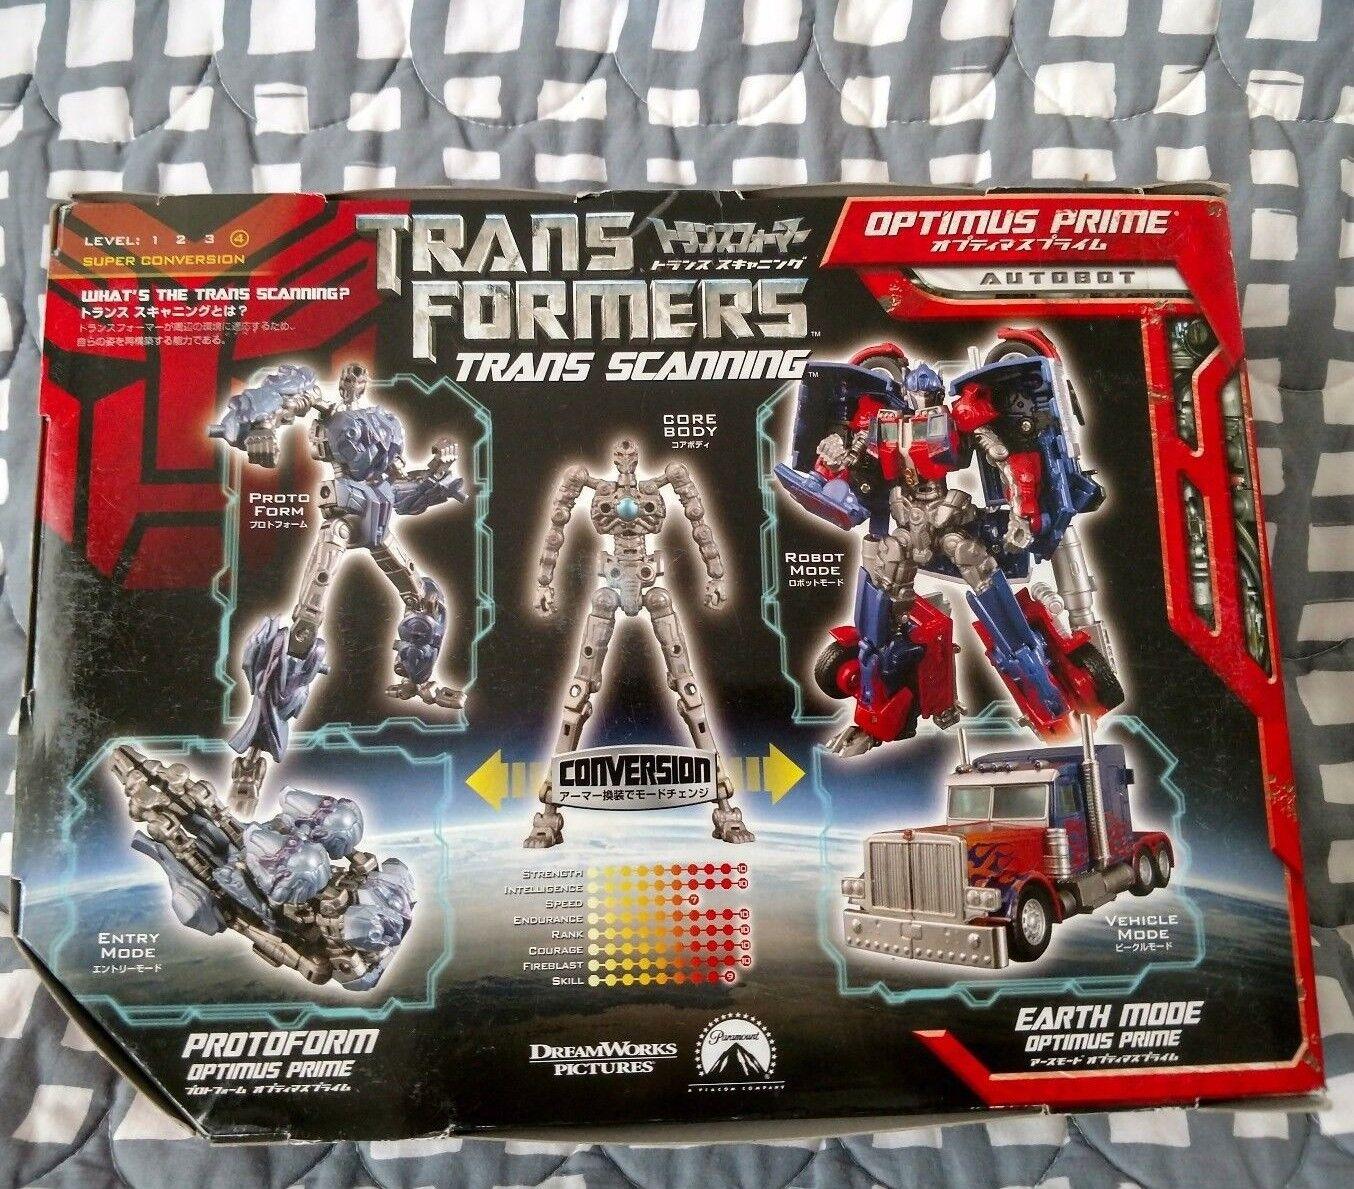 Takara Takara Takara TransFormers Protoform Trans Scanning Optimus Prime Movie MISB G1 aoe NEW 297db6